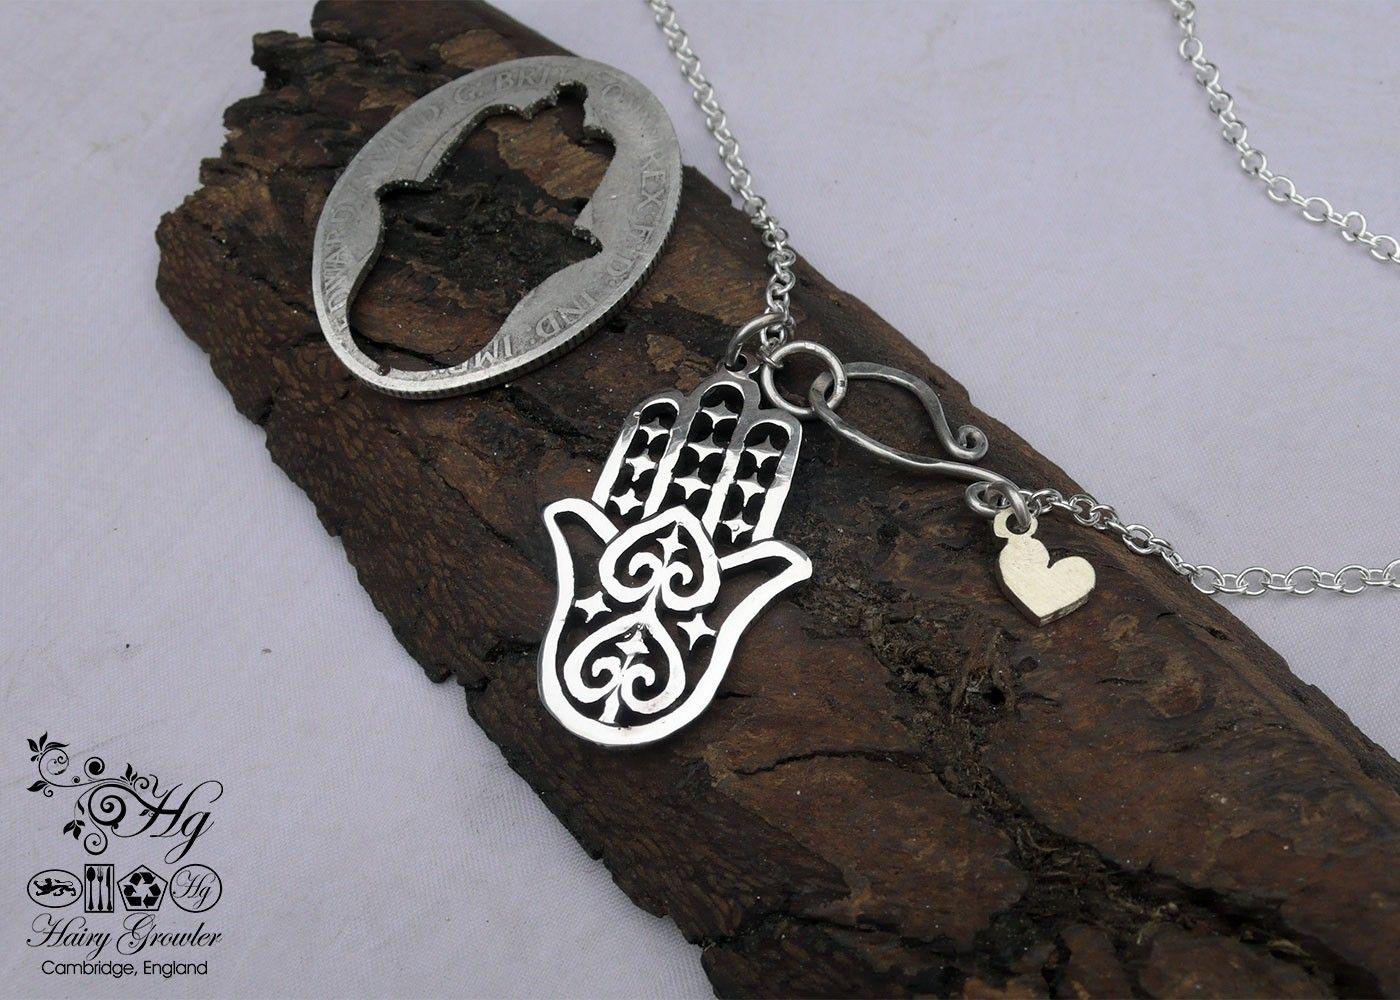 Hand of hamsa fatima silver pendants handmade and recycled hand of hamsa fatima silver pendants handmade and recycled using silver coins khmissa mozeypictures Gallery